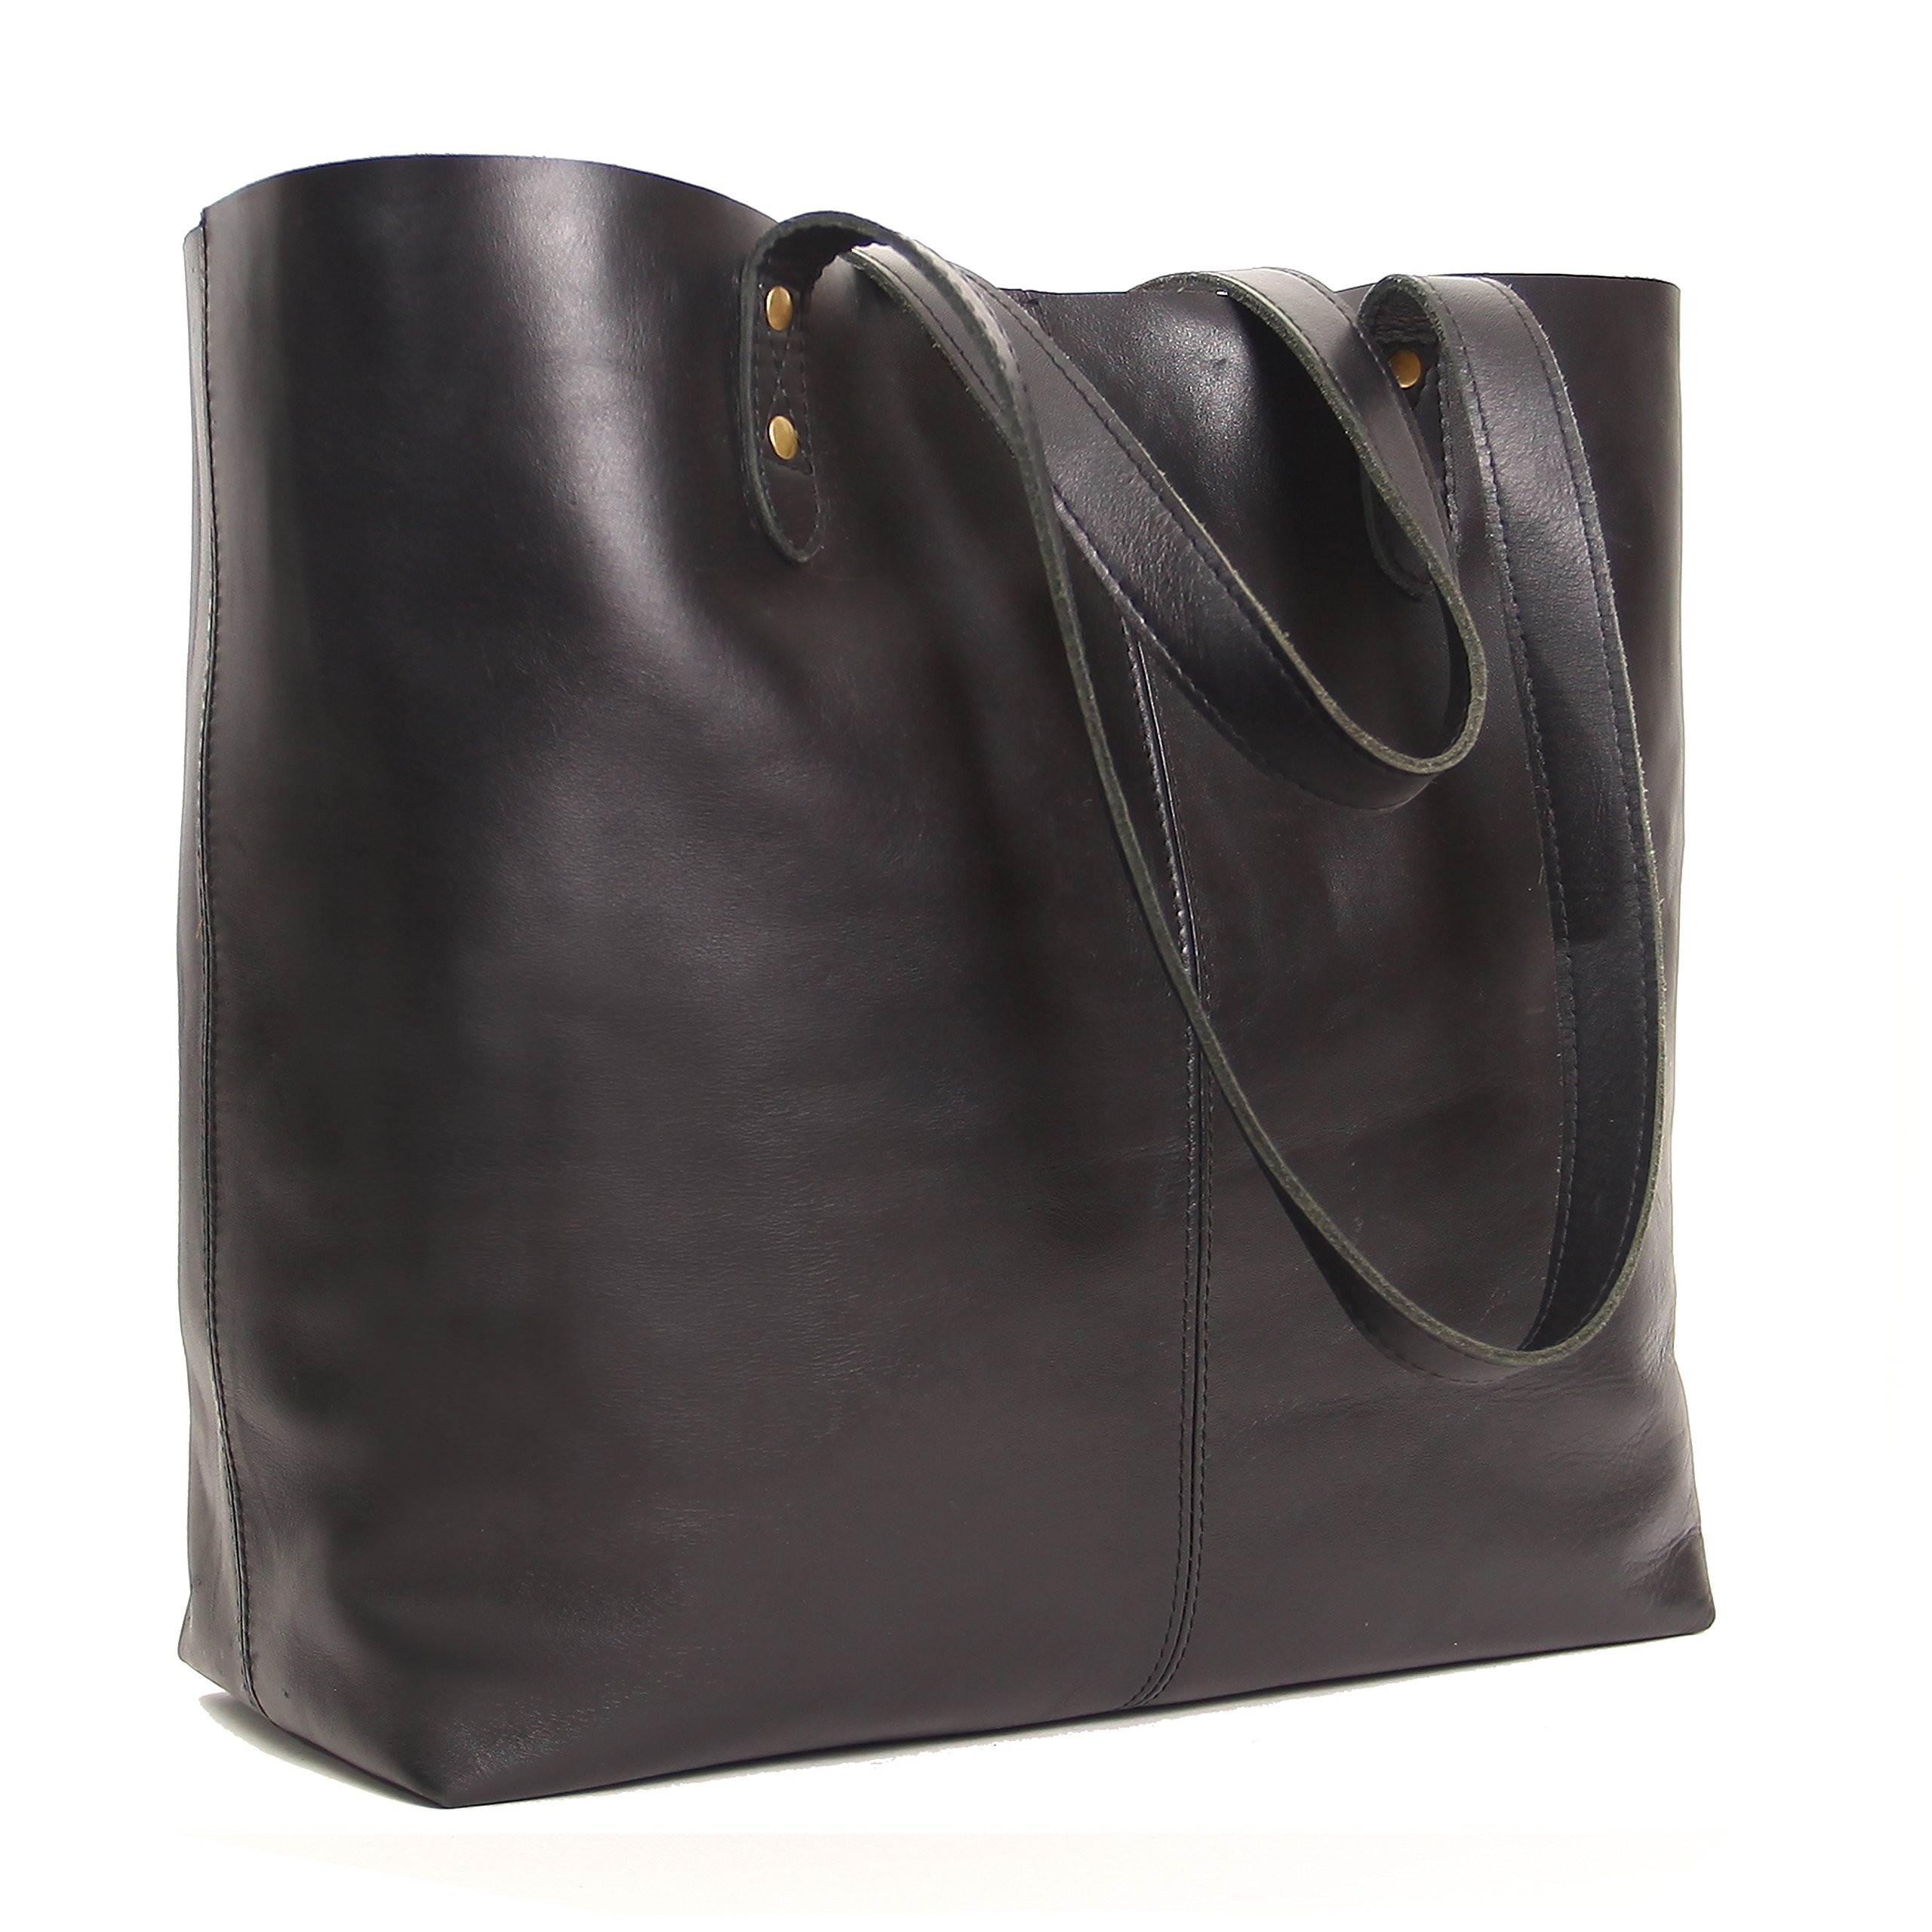 Genuine Leather Tote Bag, Large Everyday Shoulder Bag for Work, Shopping, Gym or Travel (Black)